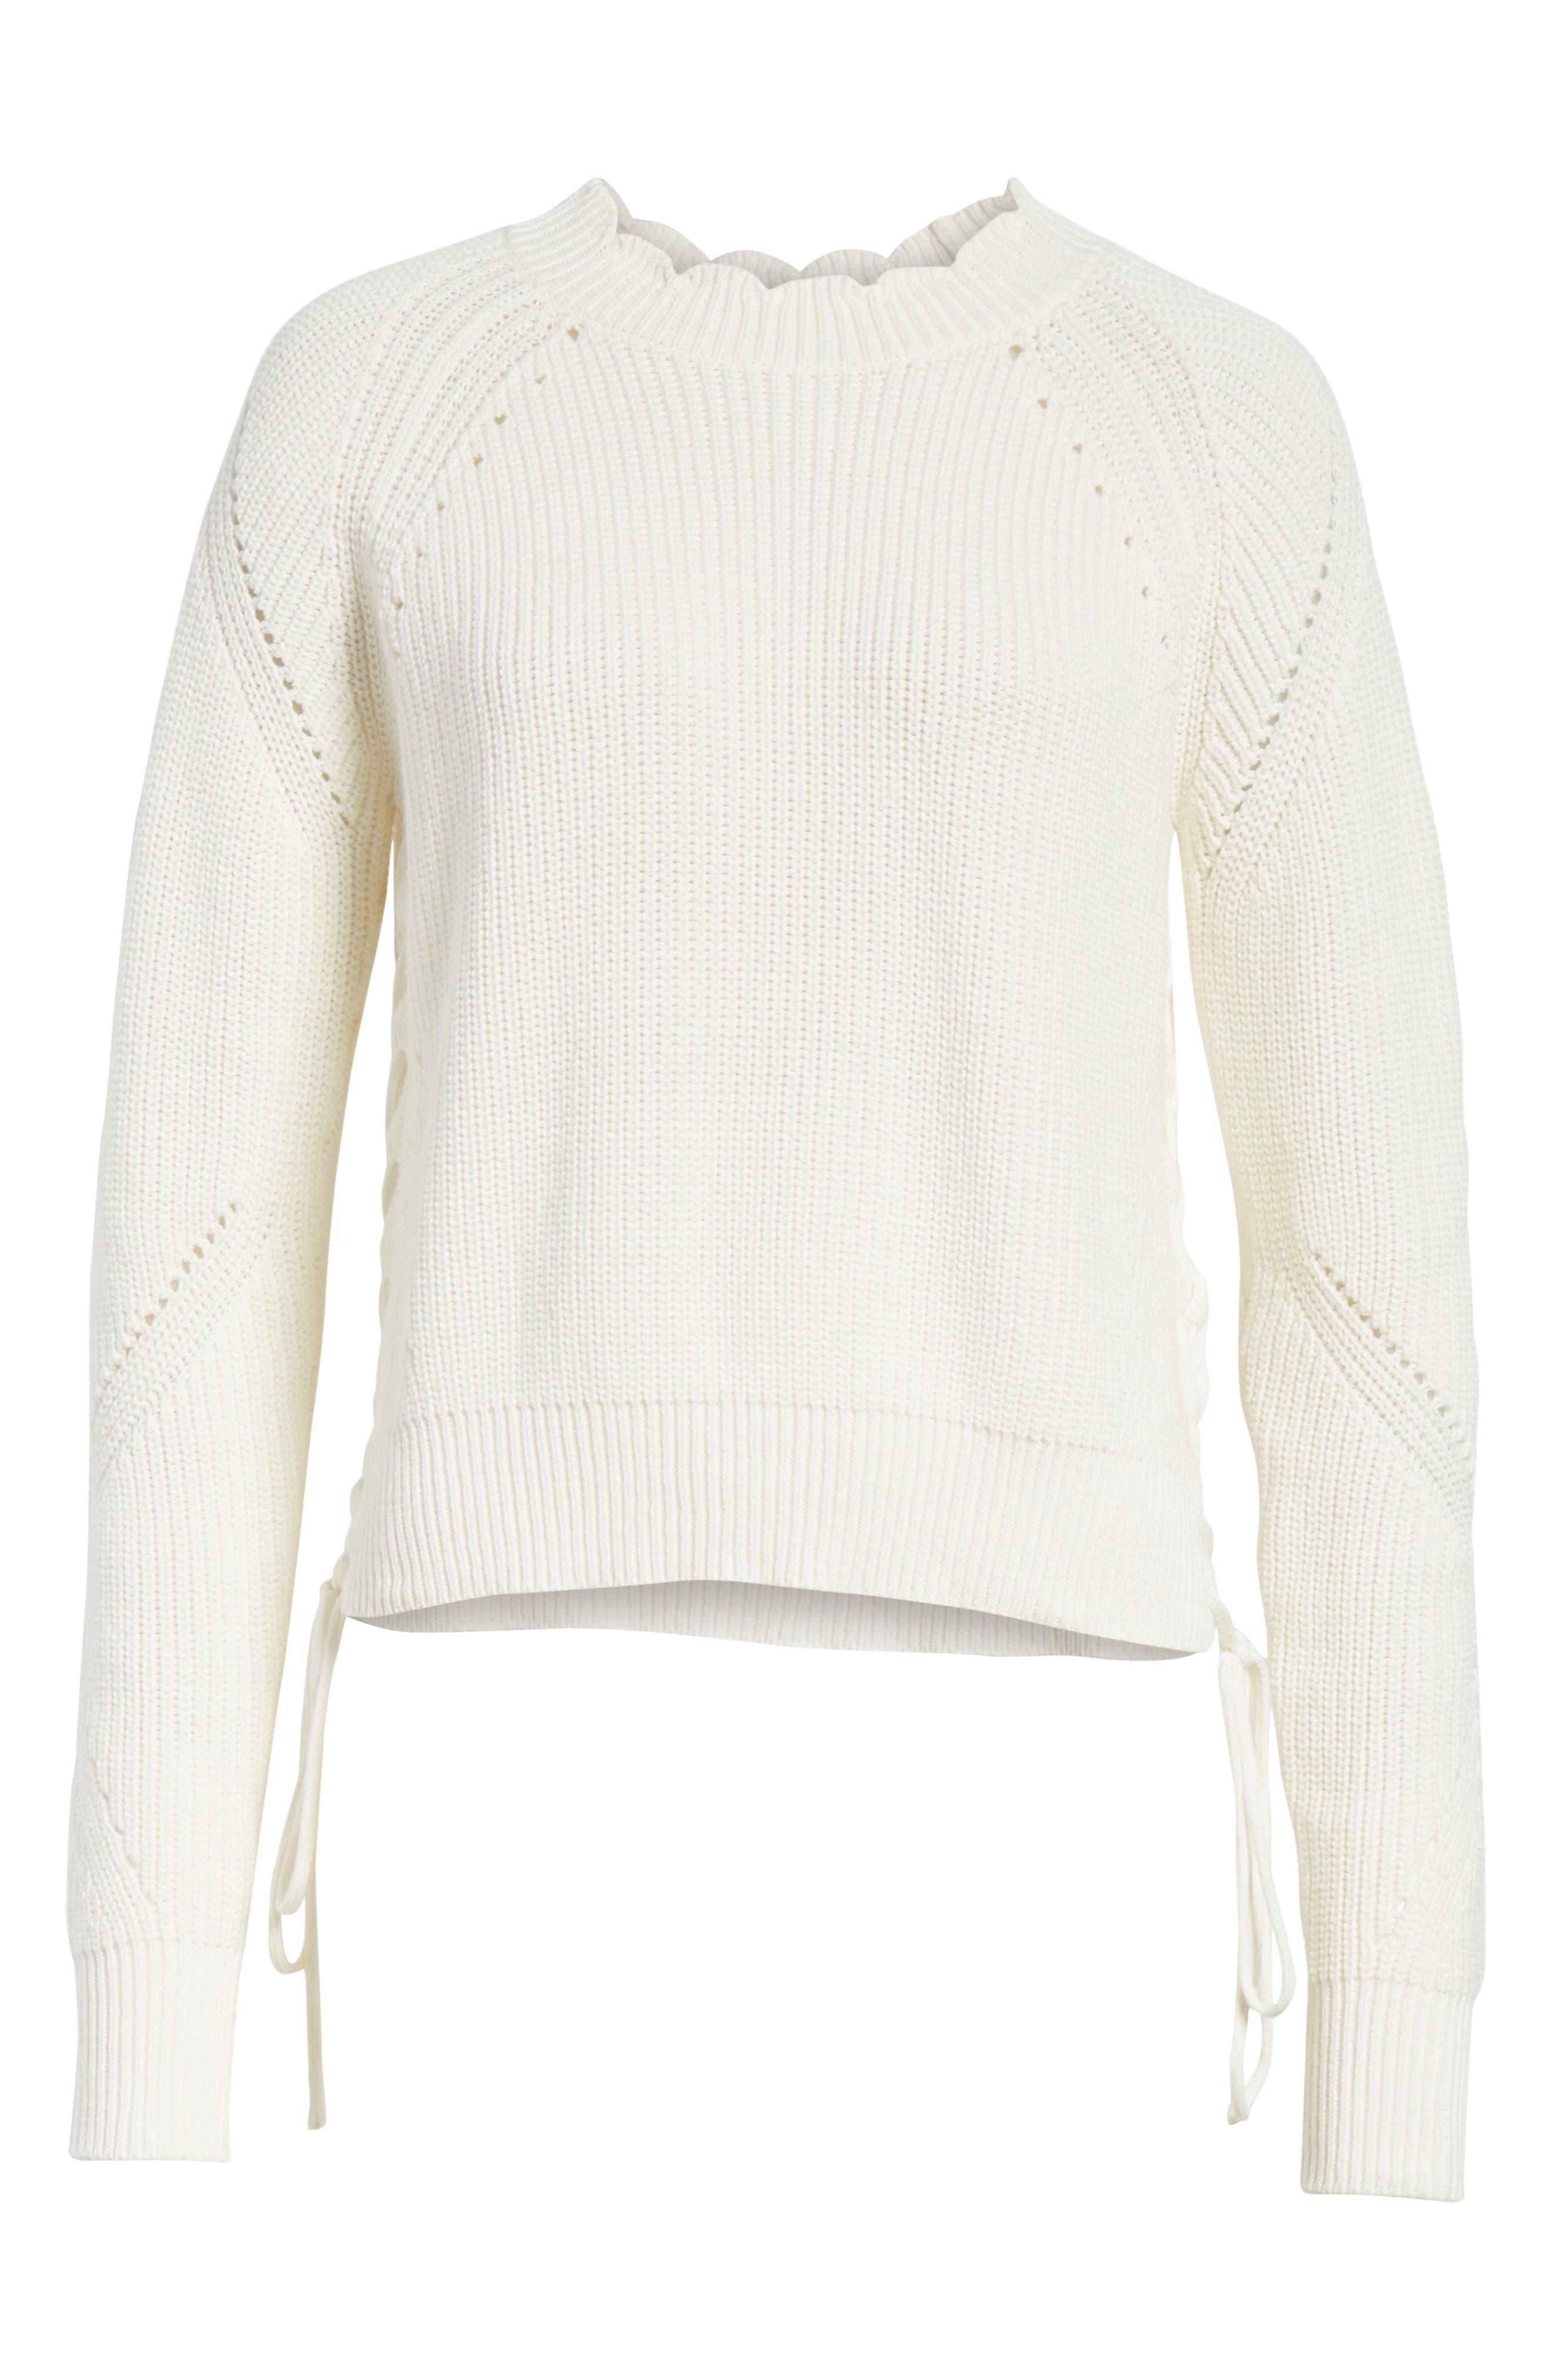 Adanya Sweater,                             Alternate thumbnail 6, color,                             Porcelain